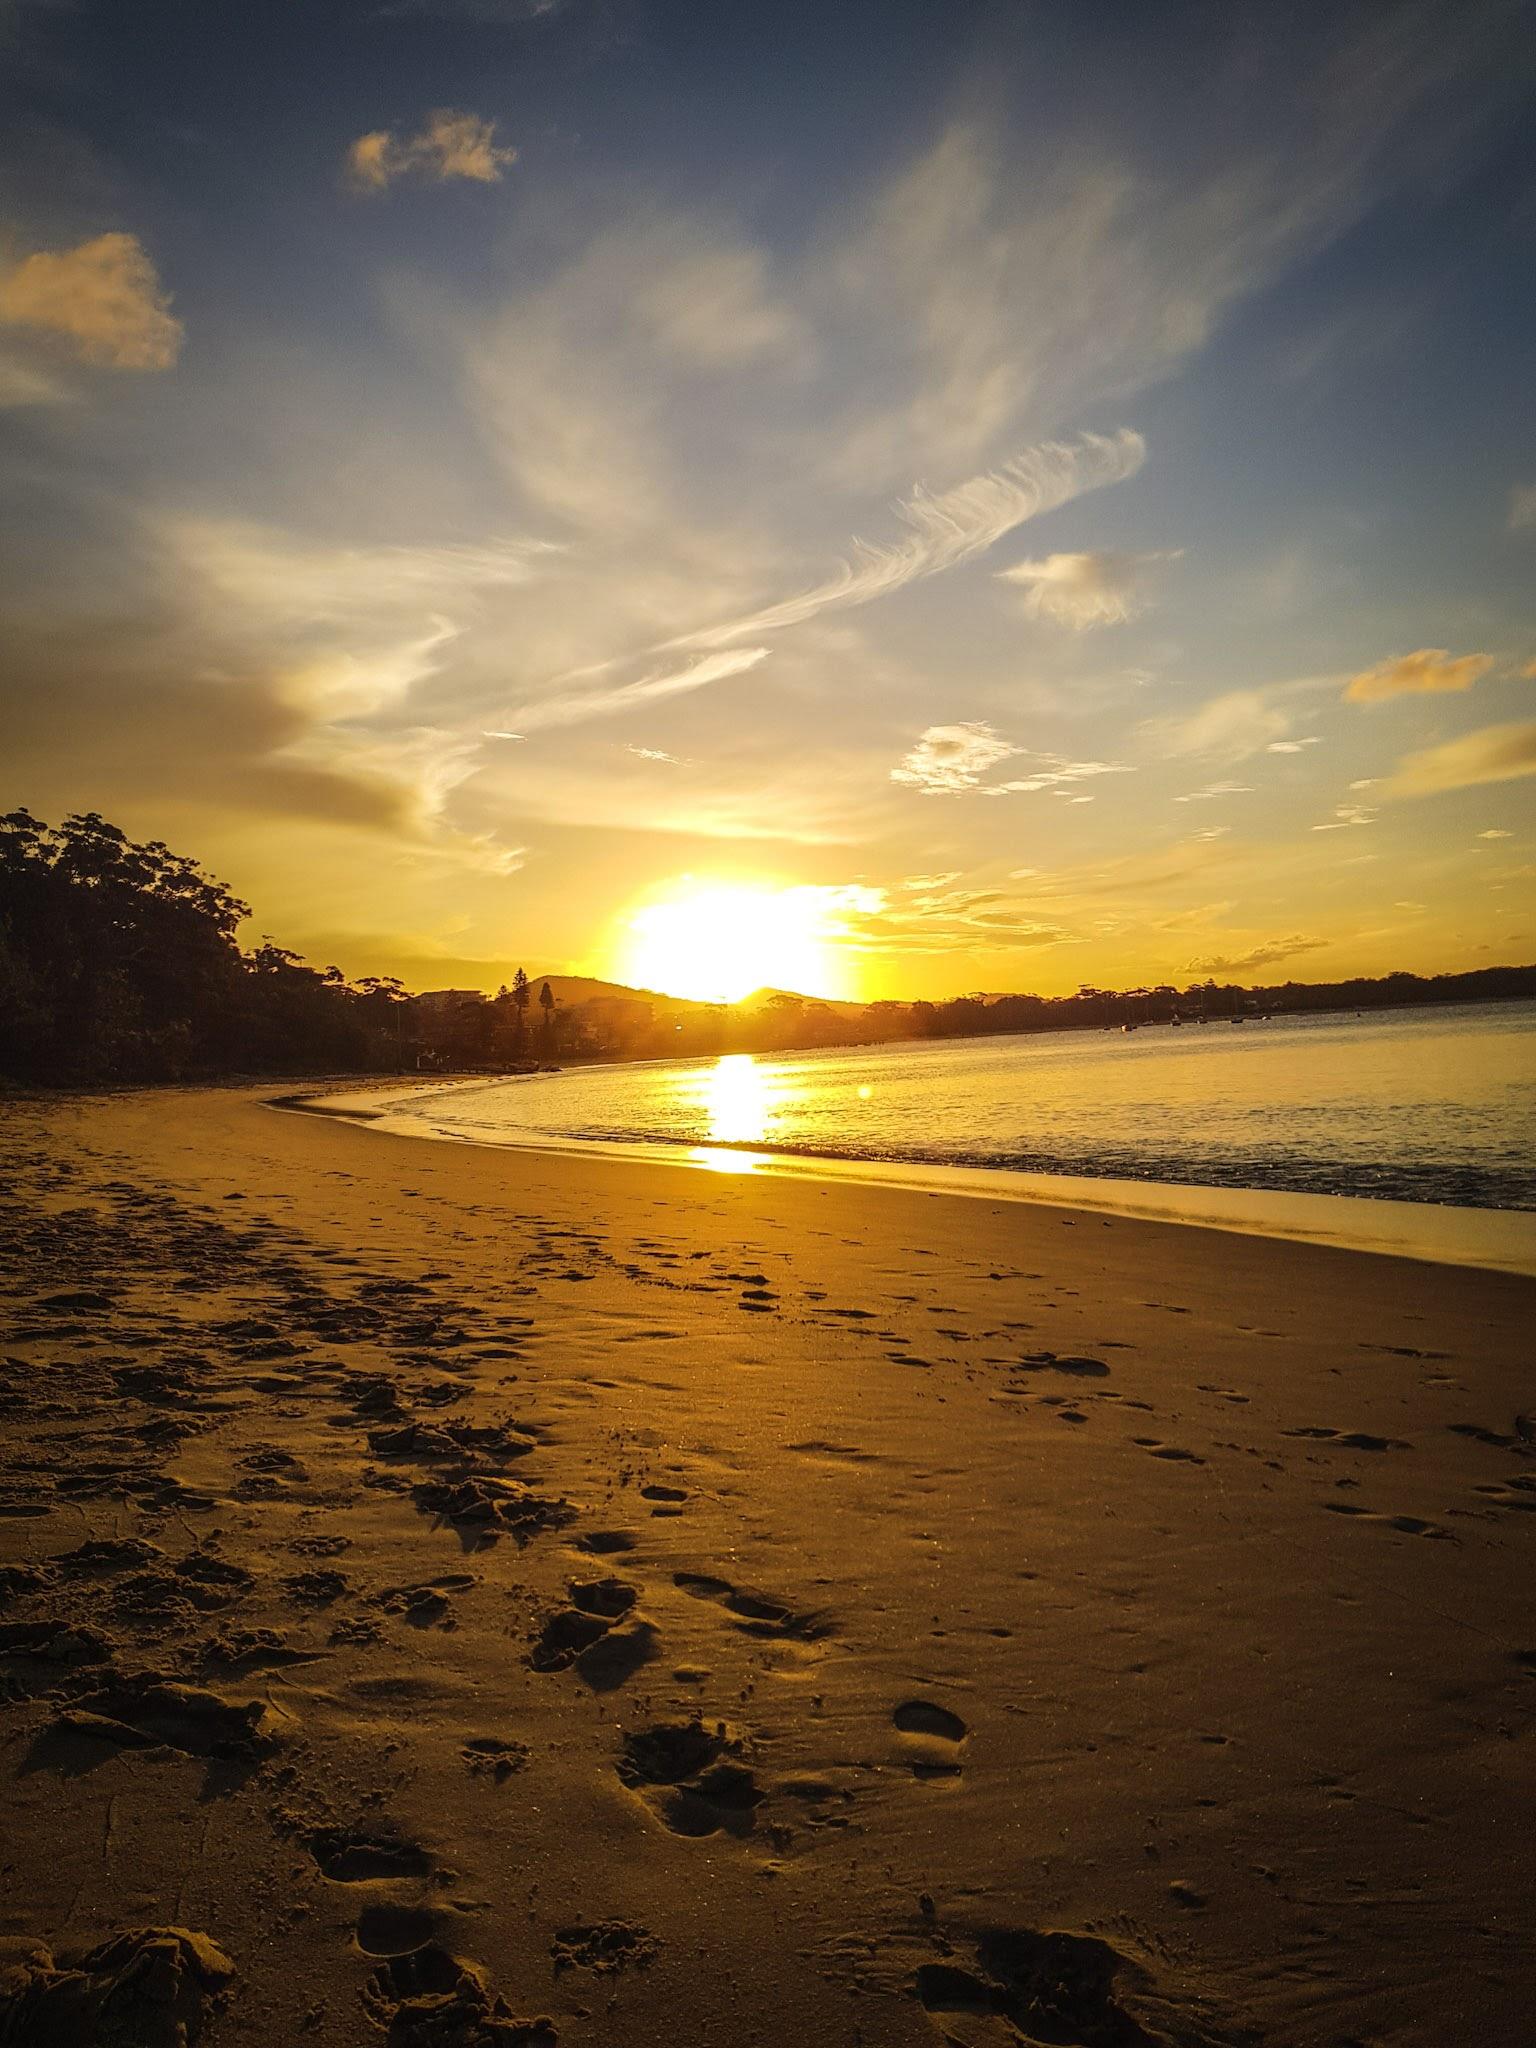 Watching the sunset.  Shoal Bay Beach, Shoal Bay  Port Stephens